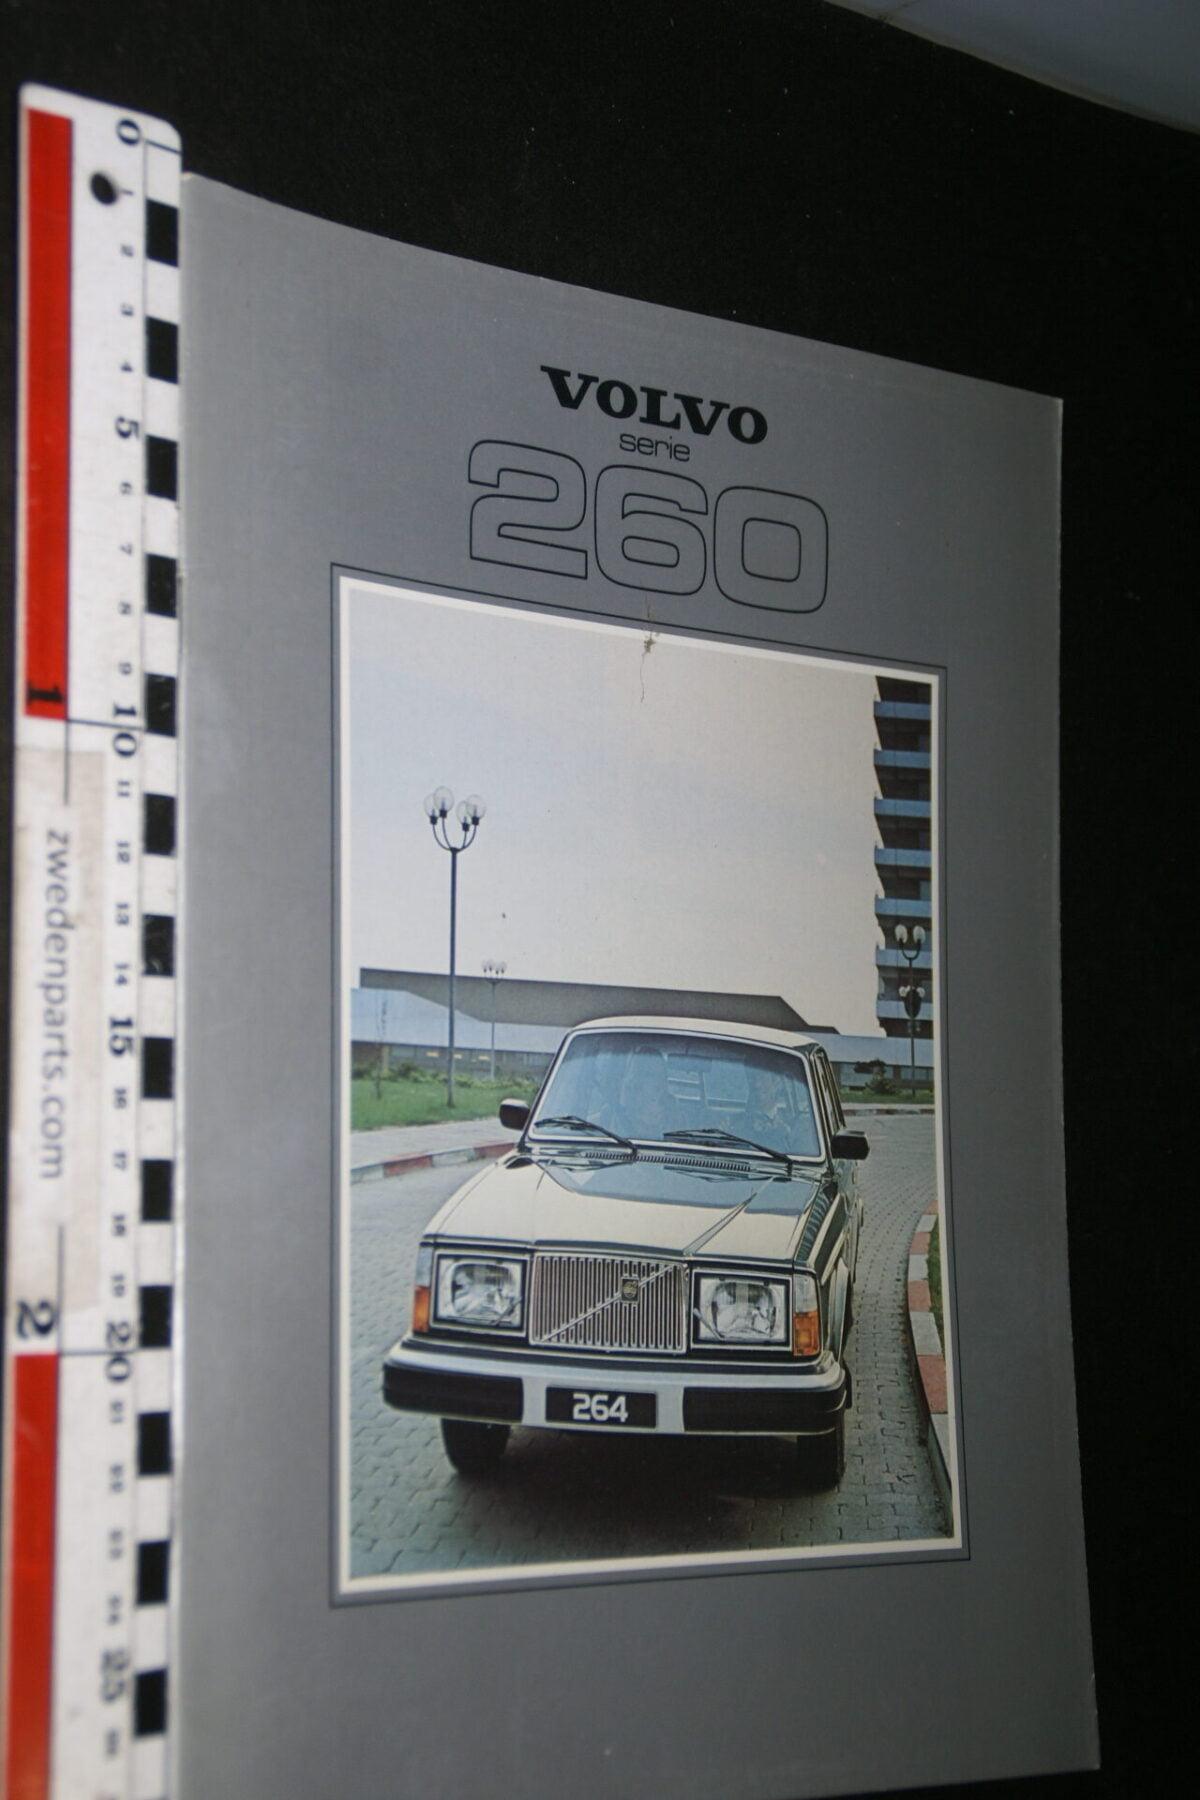 DSC06758 1979 originele brochure Volvo serie 260  met 262C nr. ASPPV 6551-87b63b79